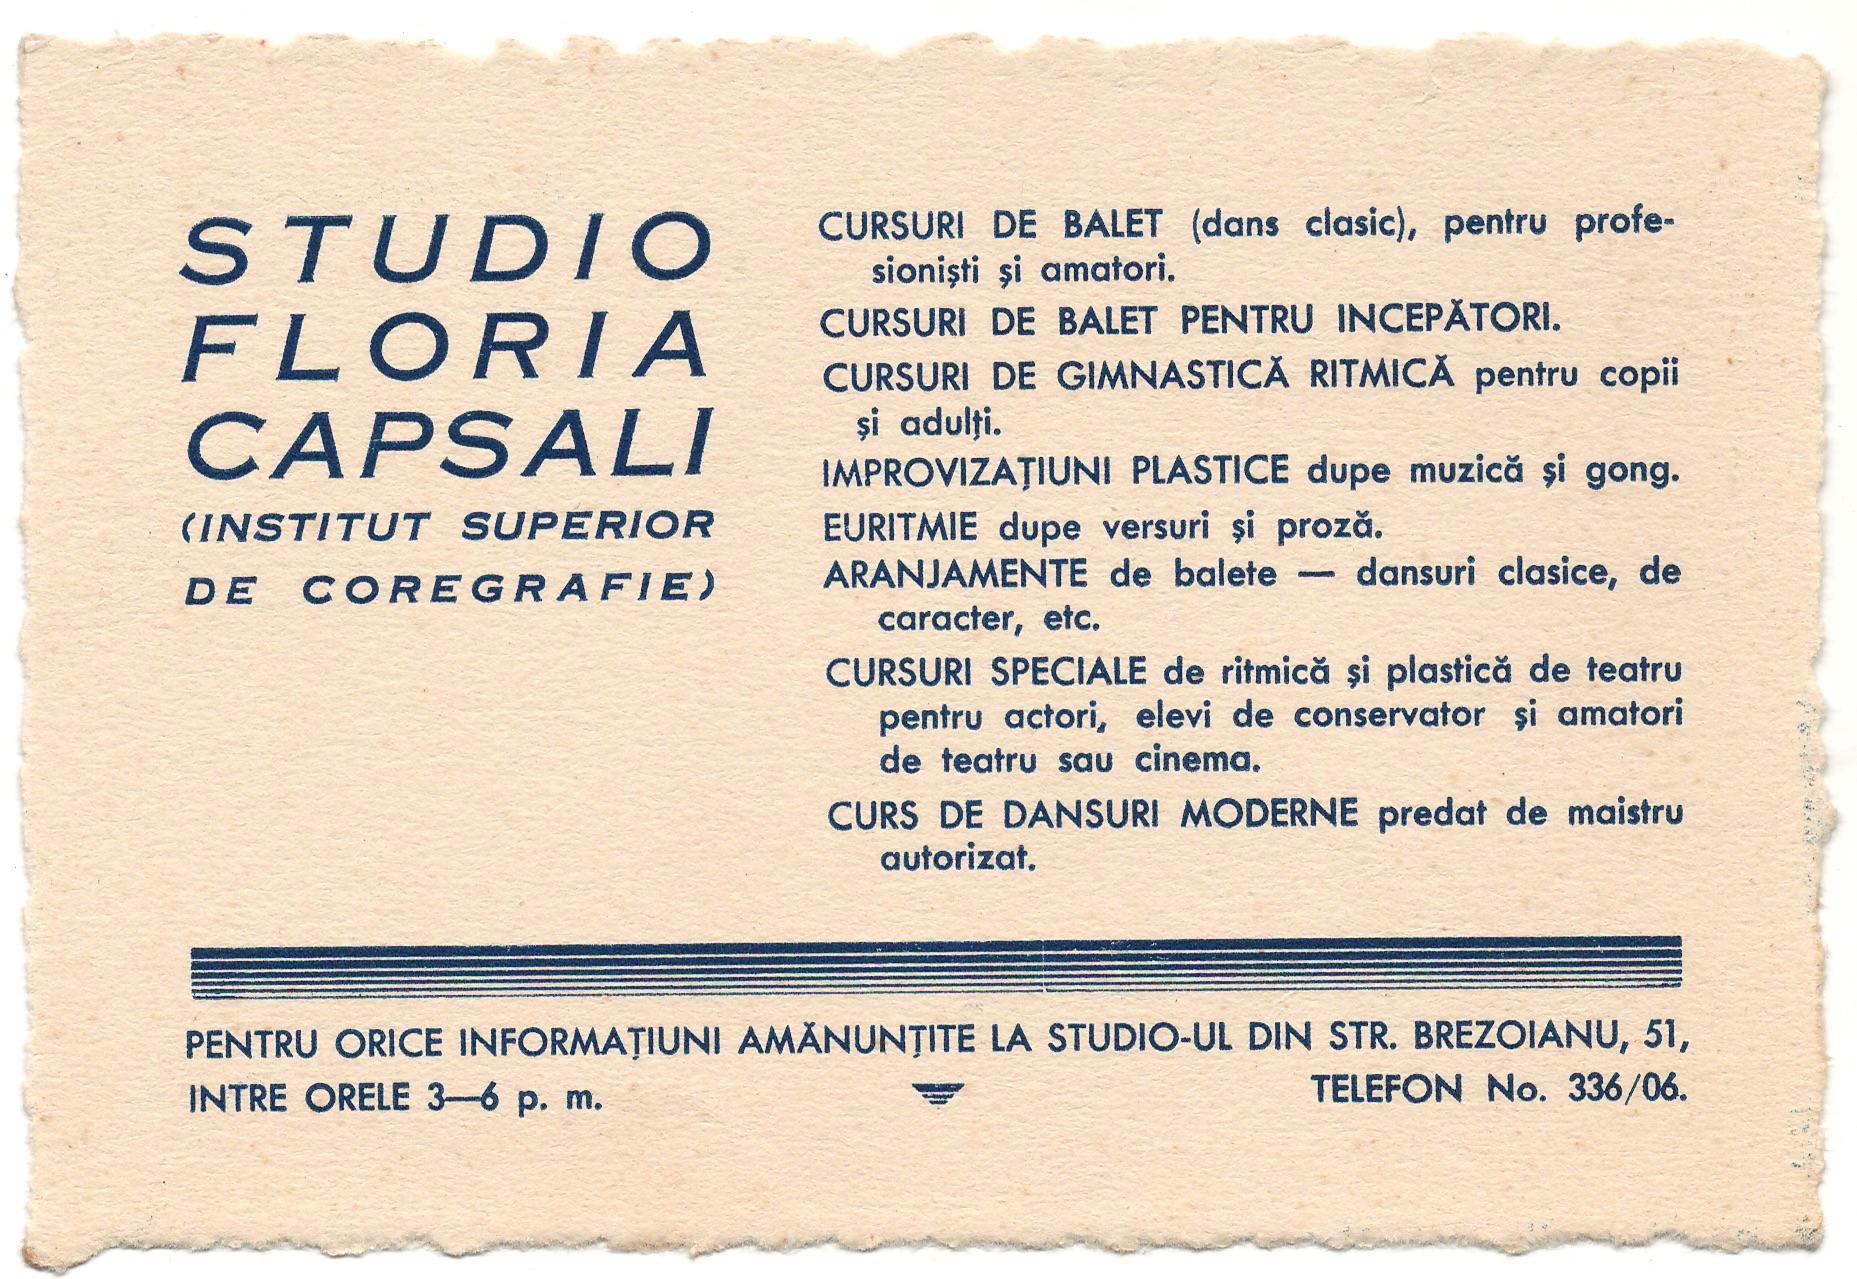 ©Arhiva CNDB (anunț Studio Floria Capsali, strada Ion Brezoianu 51)